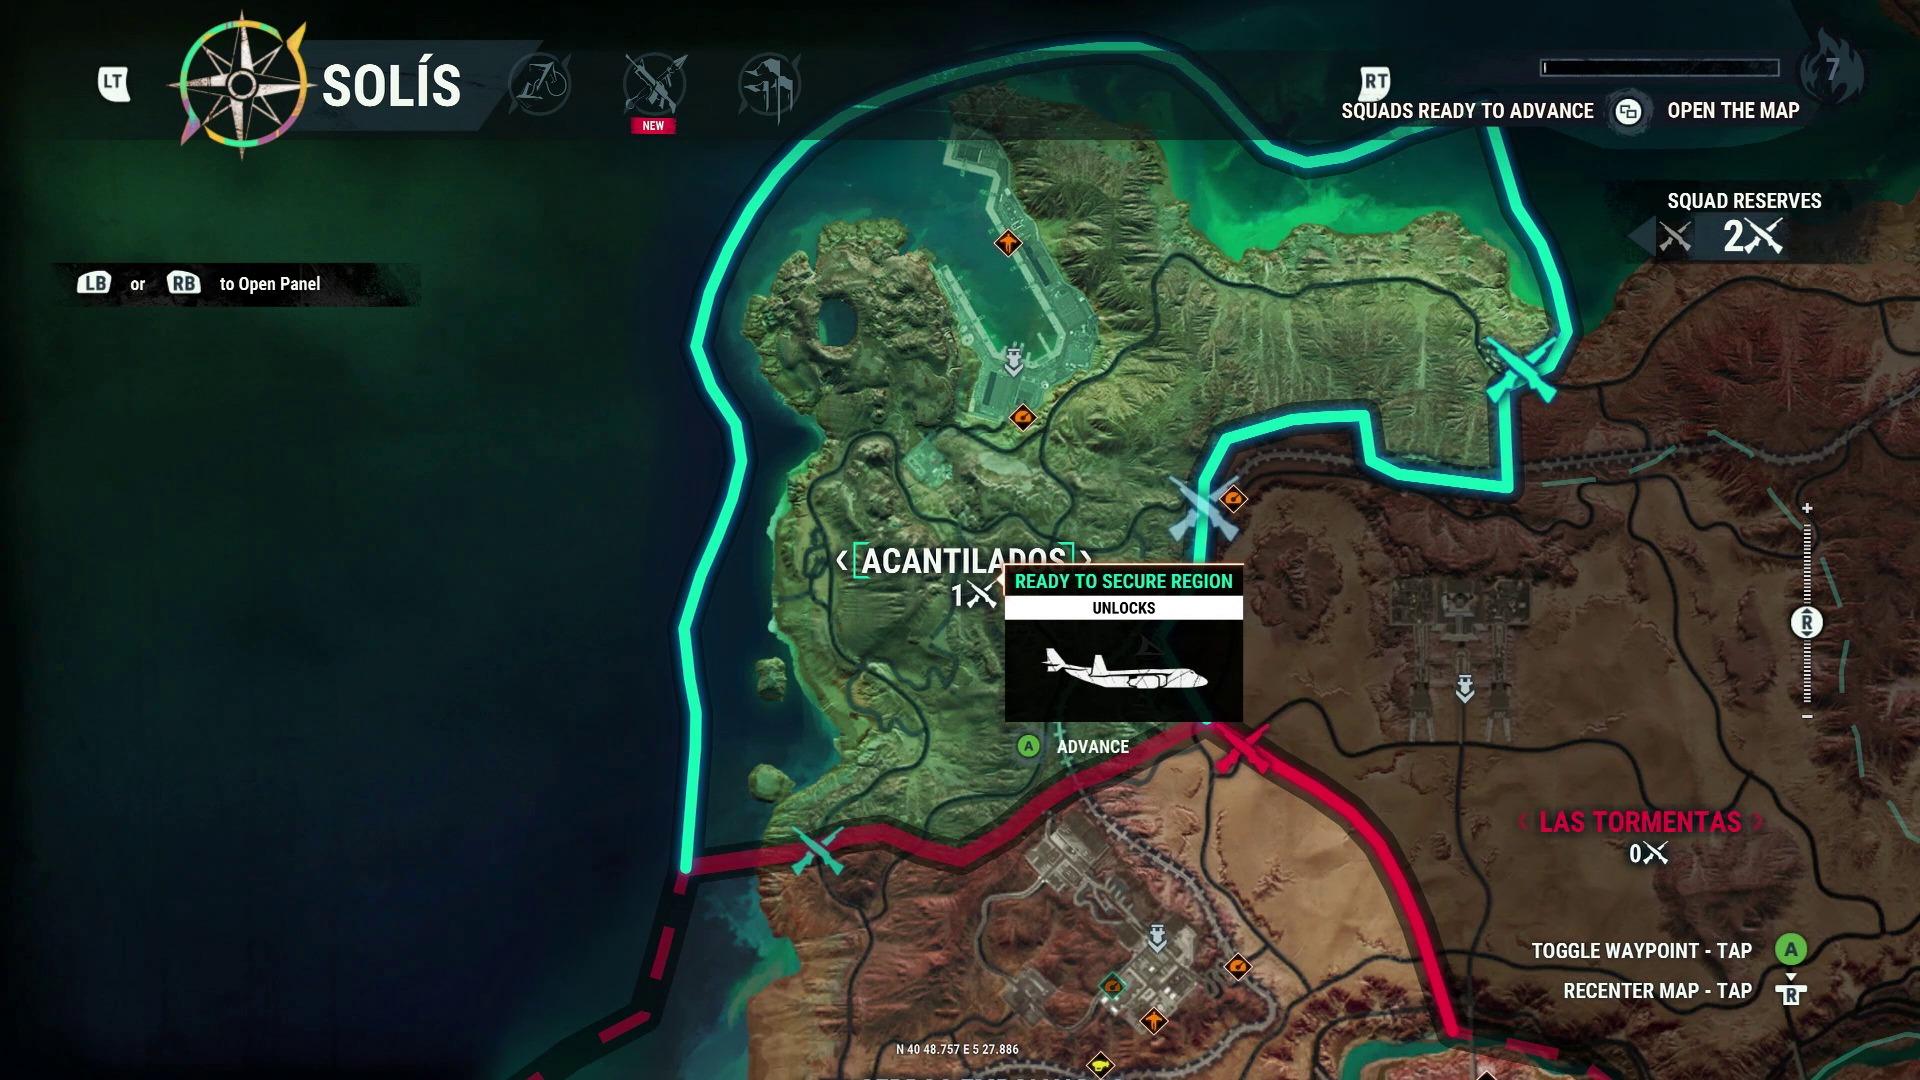 Aperçu Just Cause 4 La carte tactique de l'île